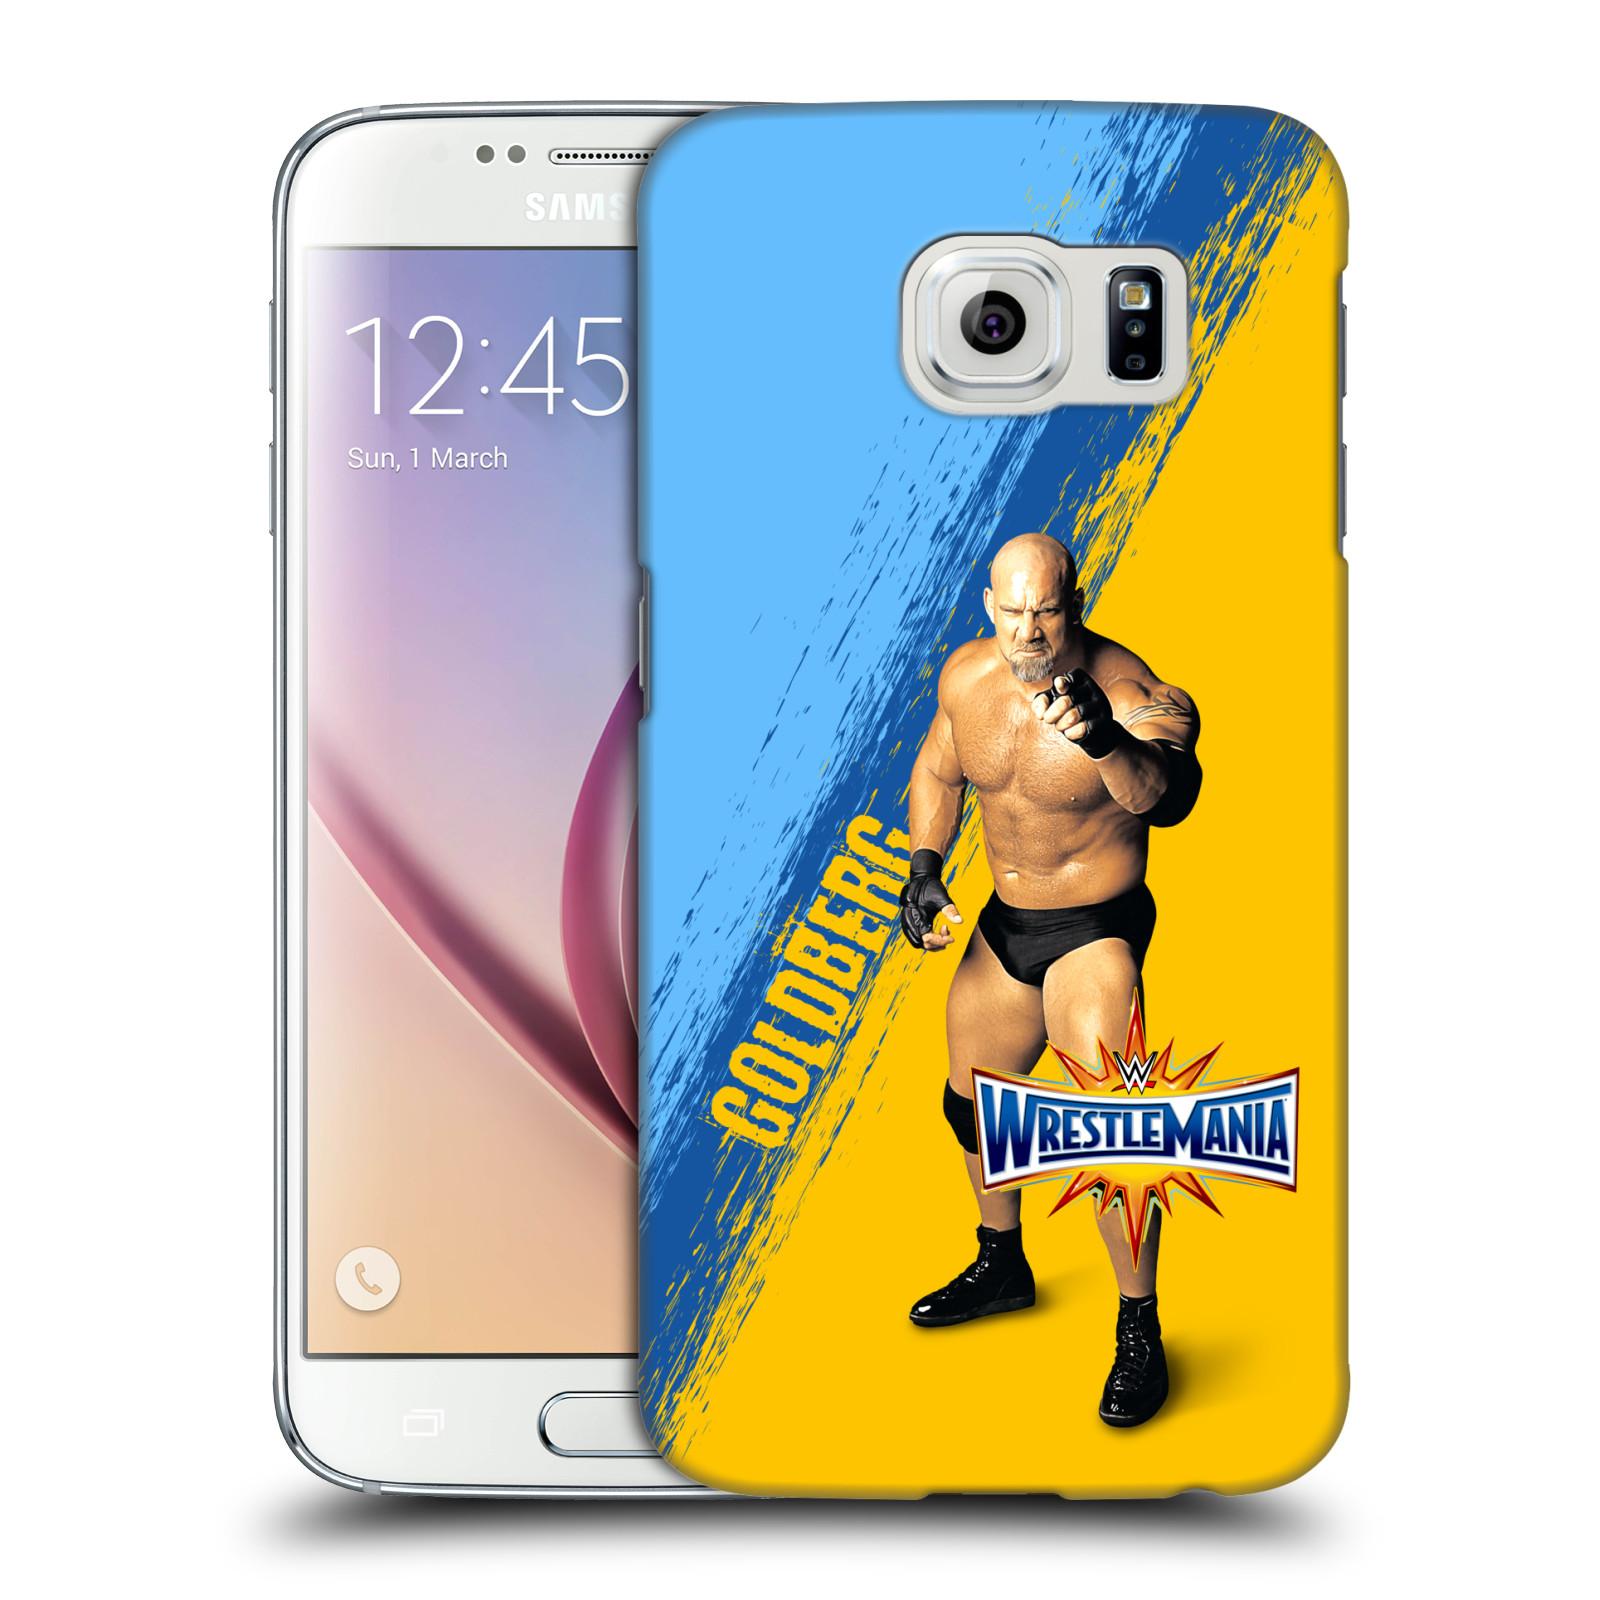 OFFICIAL WWE WRESTLEMANIA 33 HARD BACK CASE FOR SAMSUNG PHONES 1